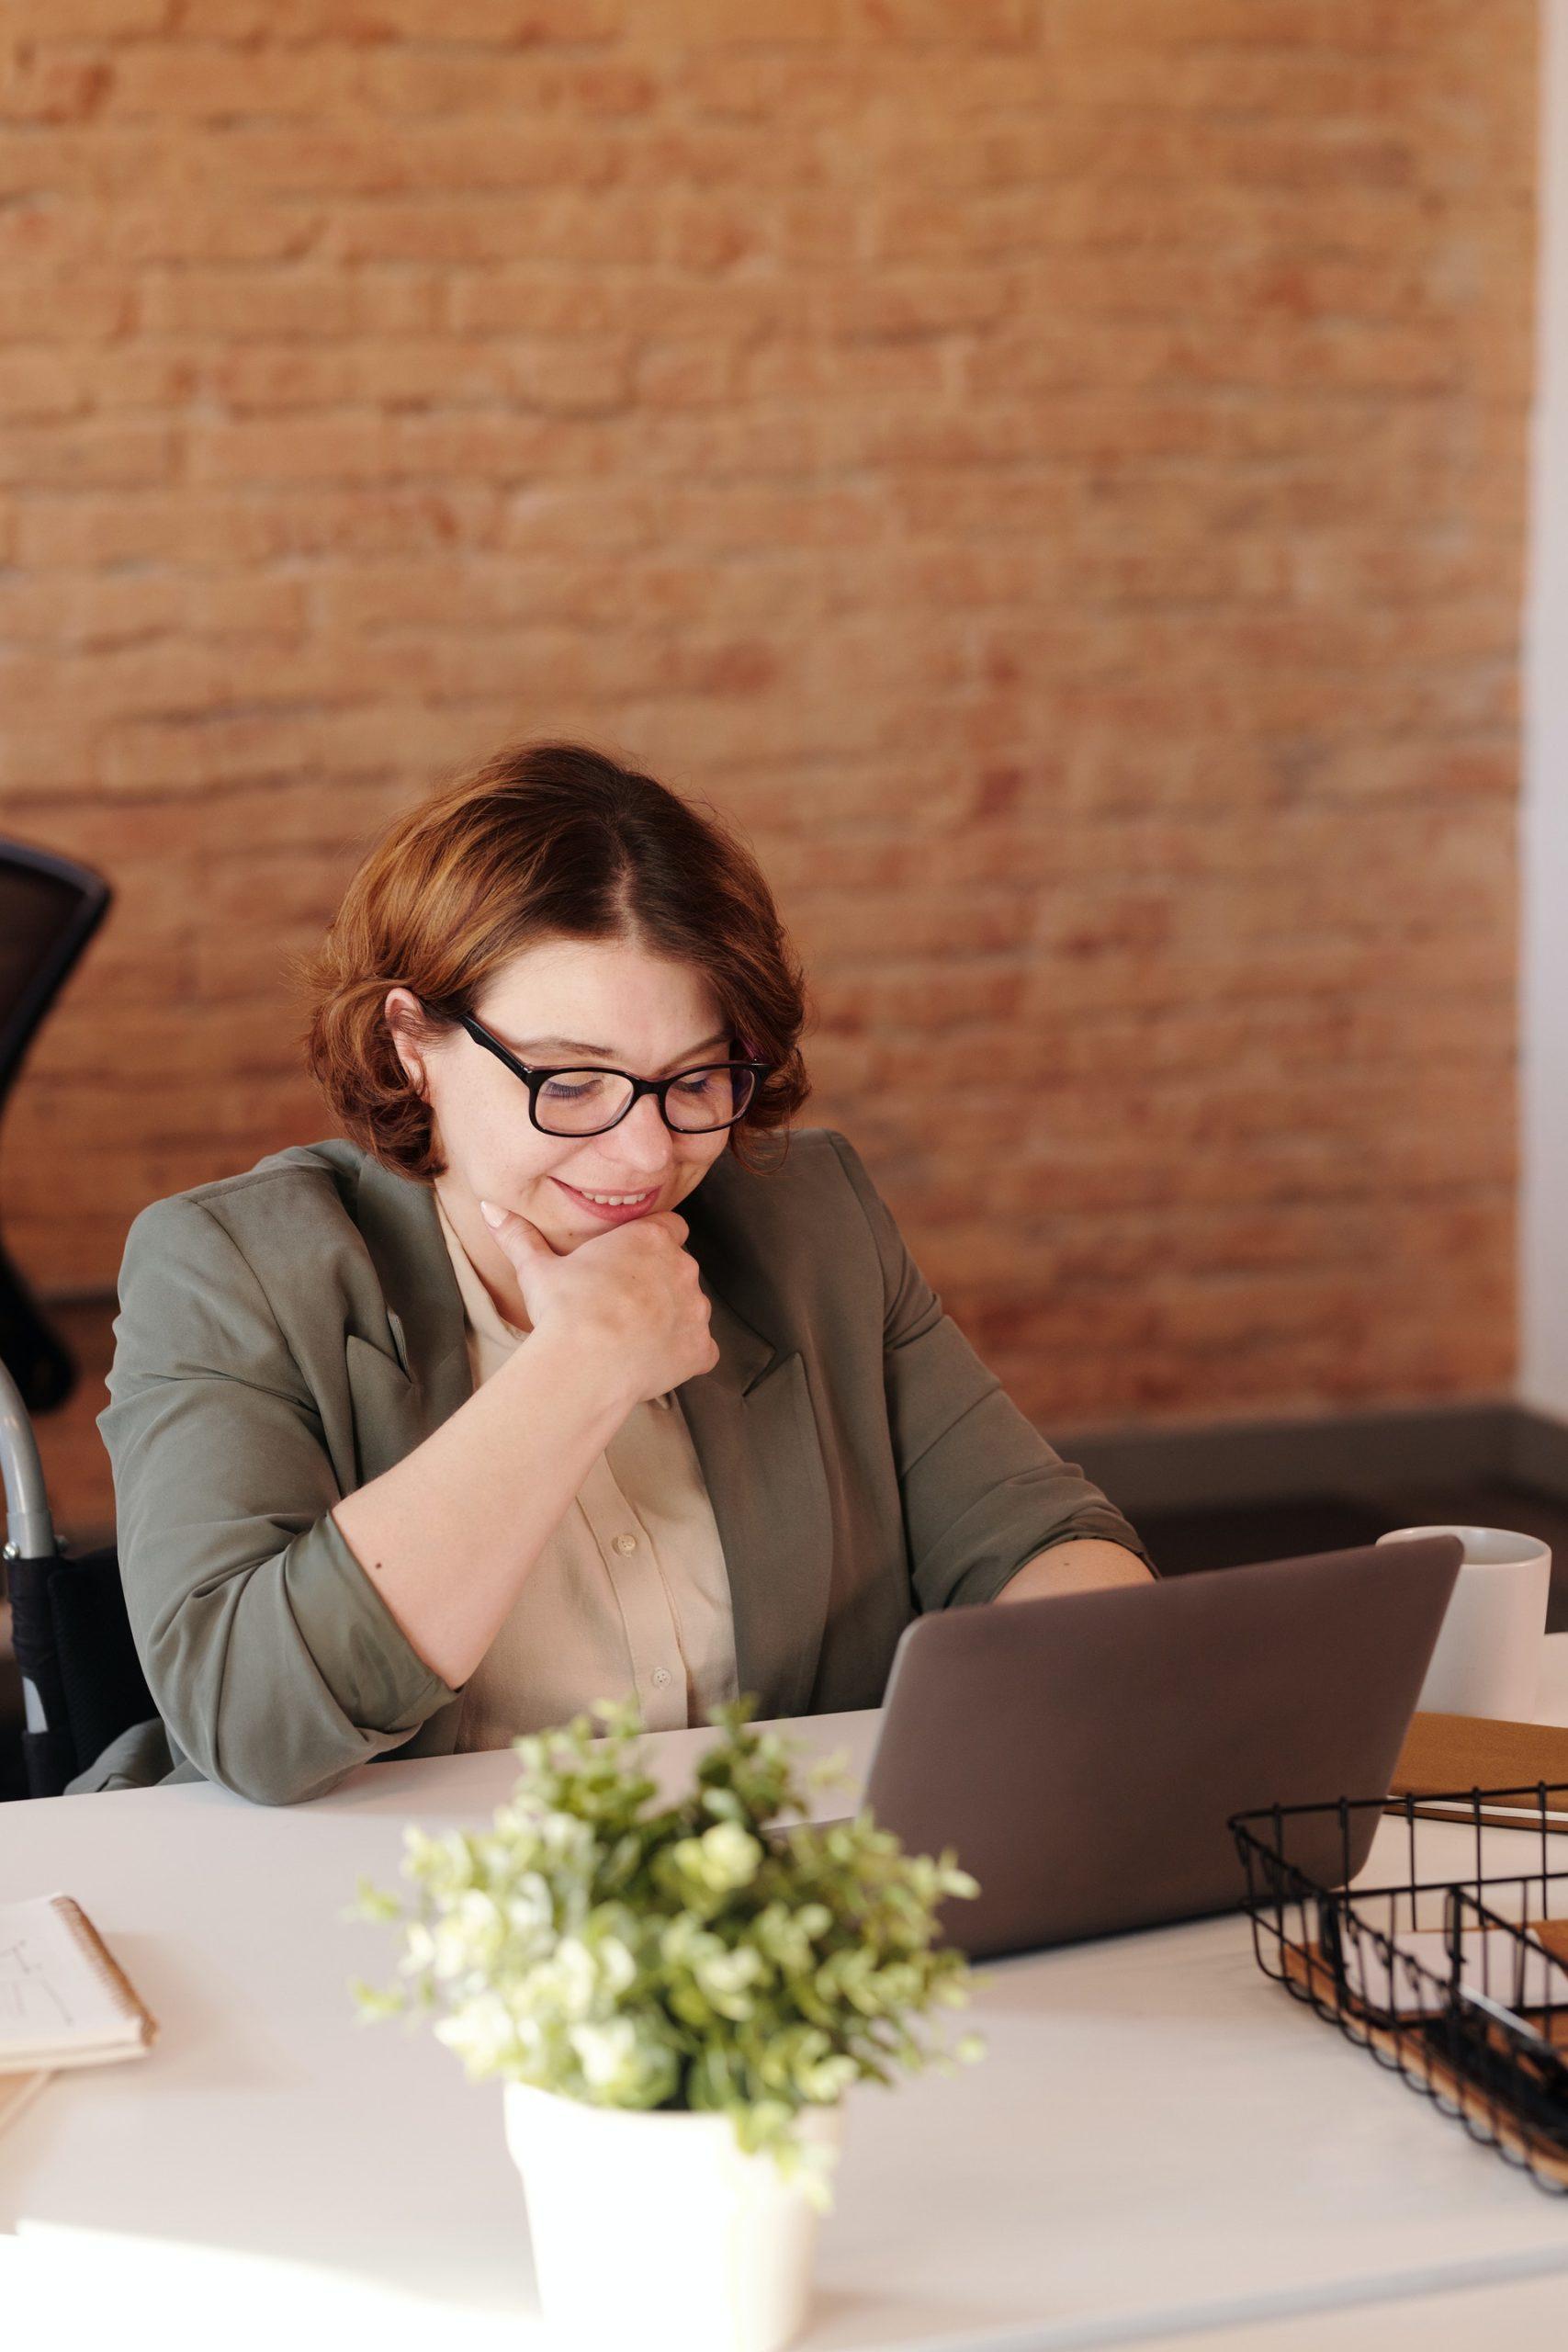 tarifs traducteur freelance